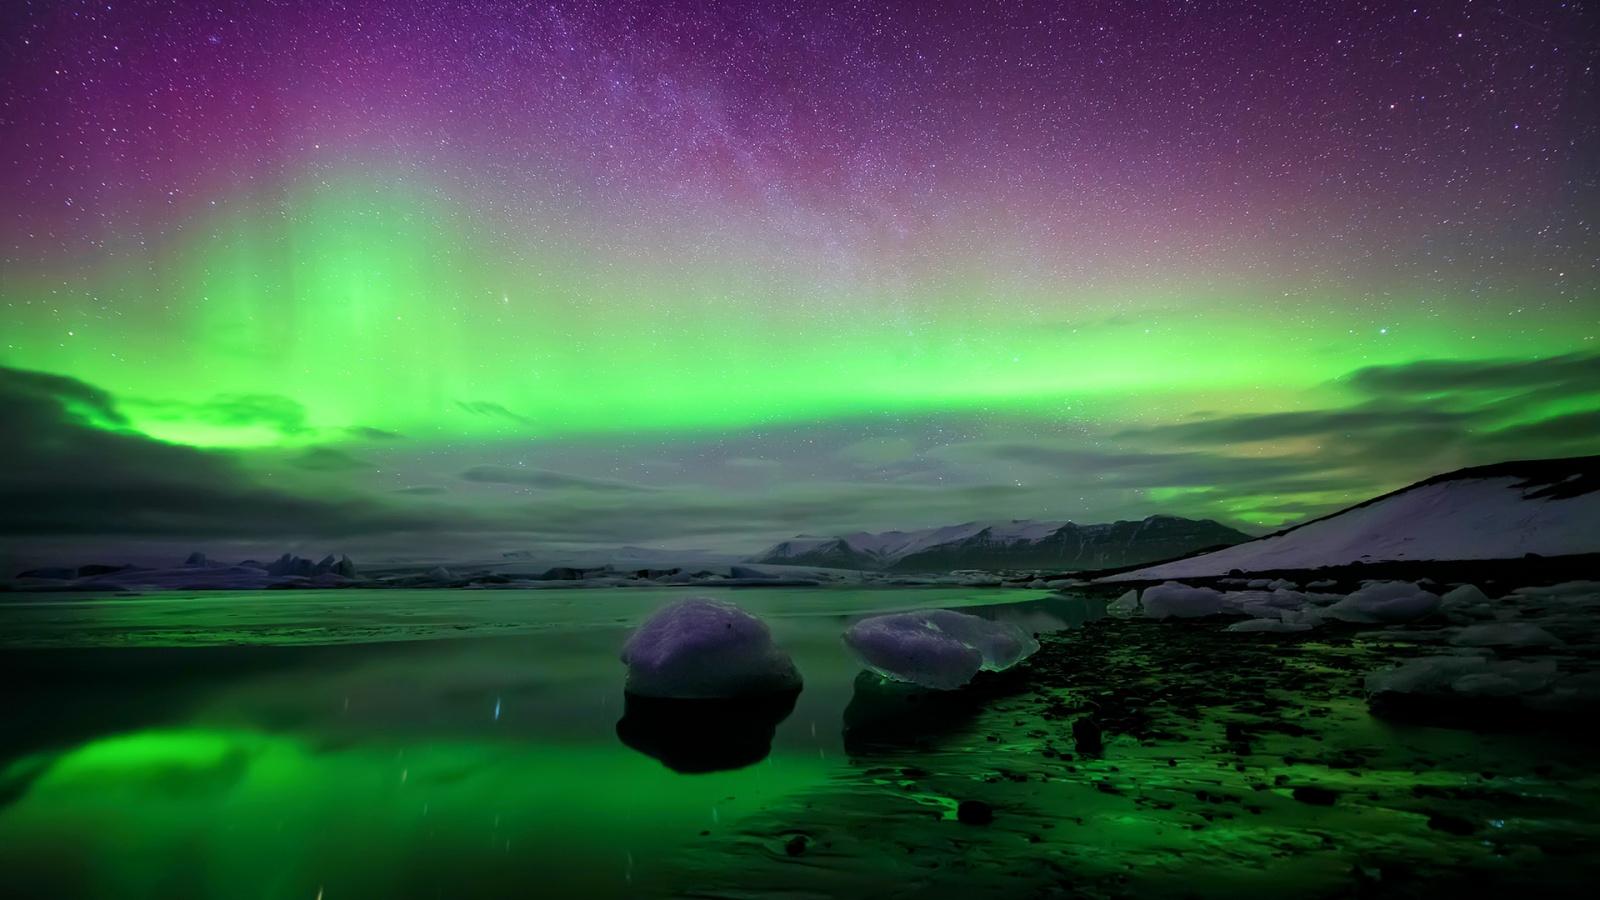 iceland-northern-lights-desktop-hd-wallpaper